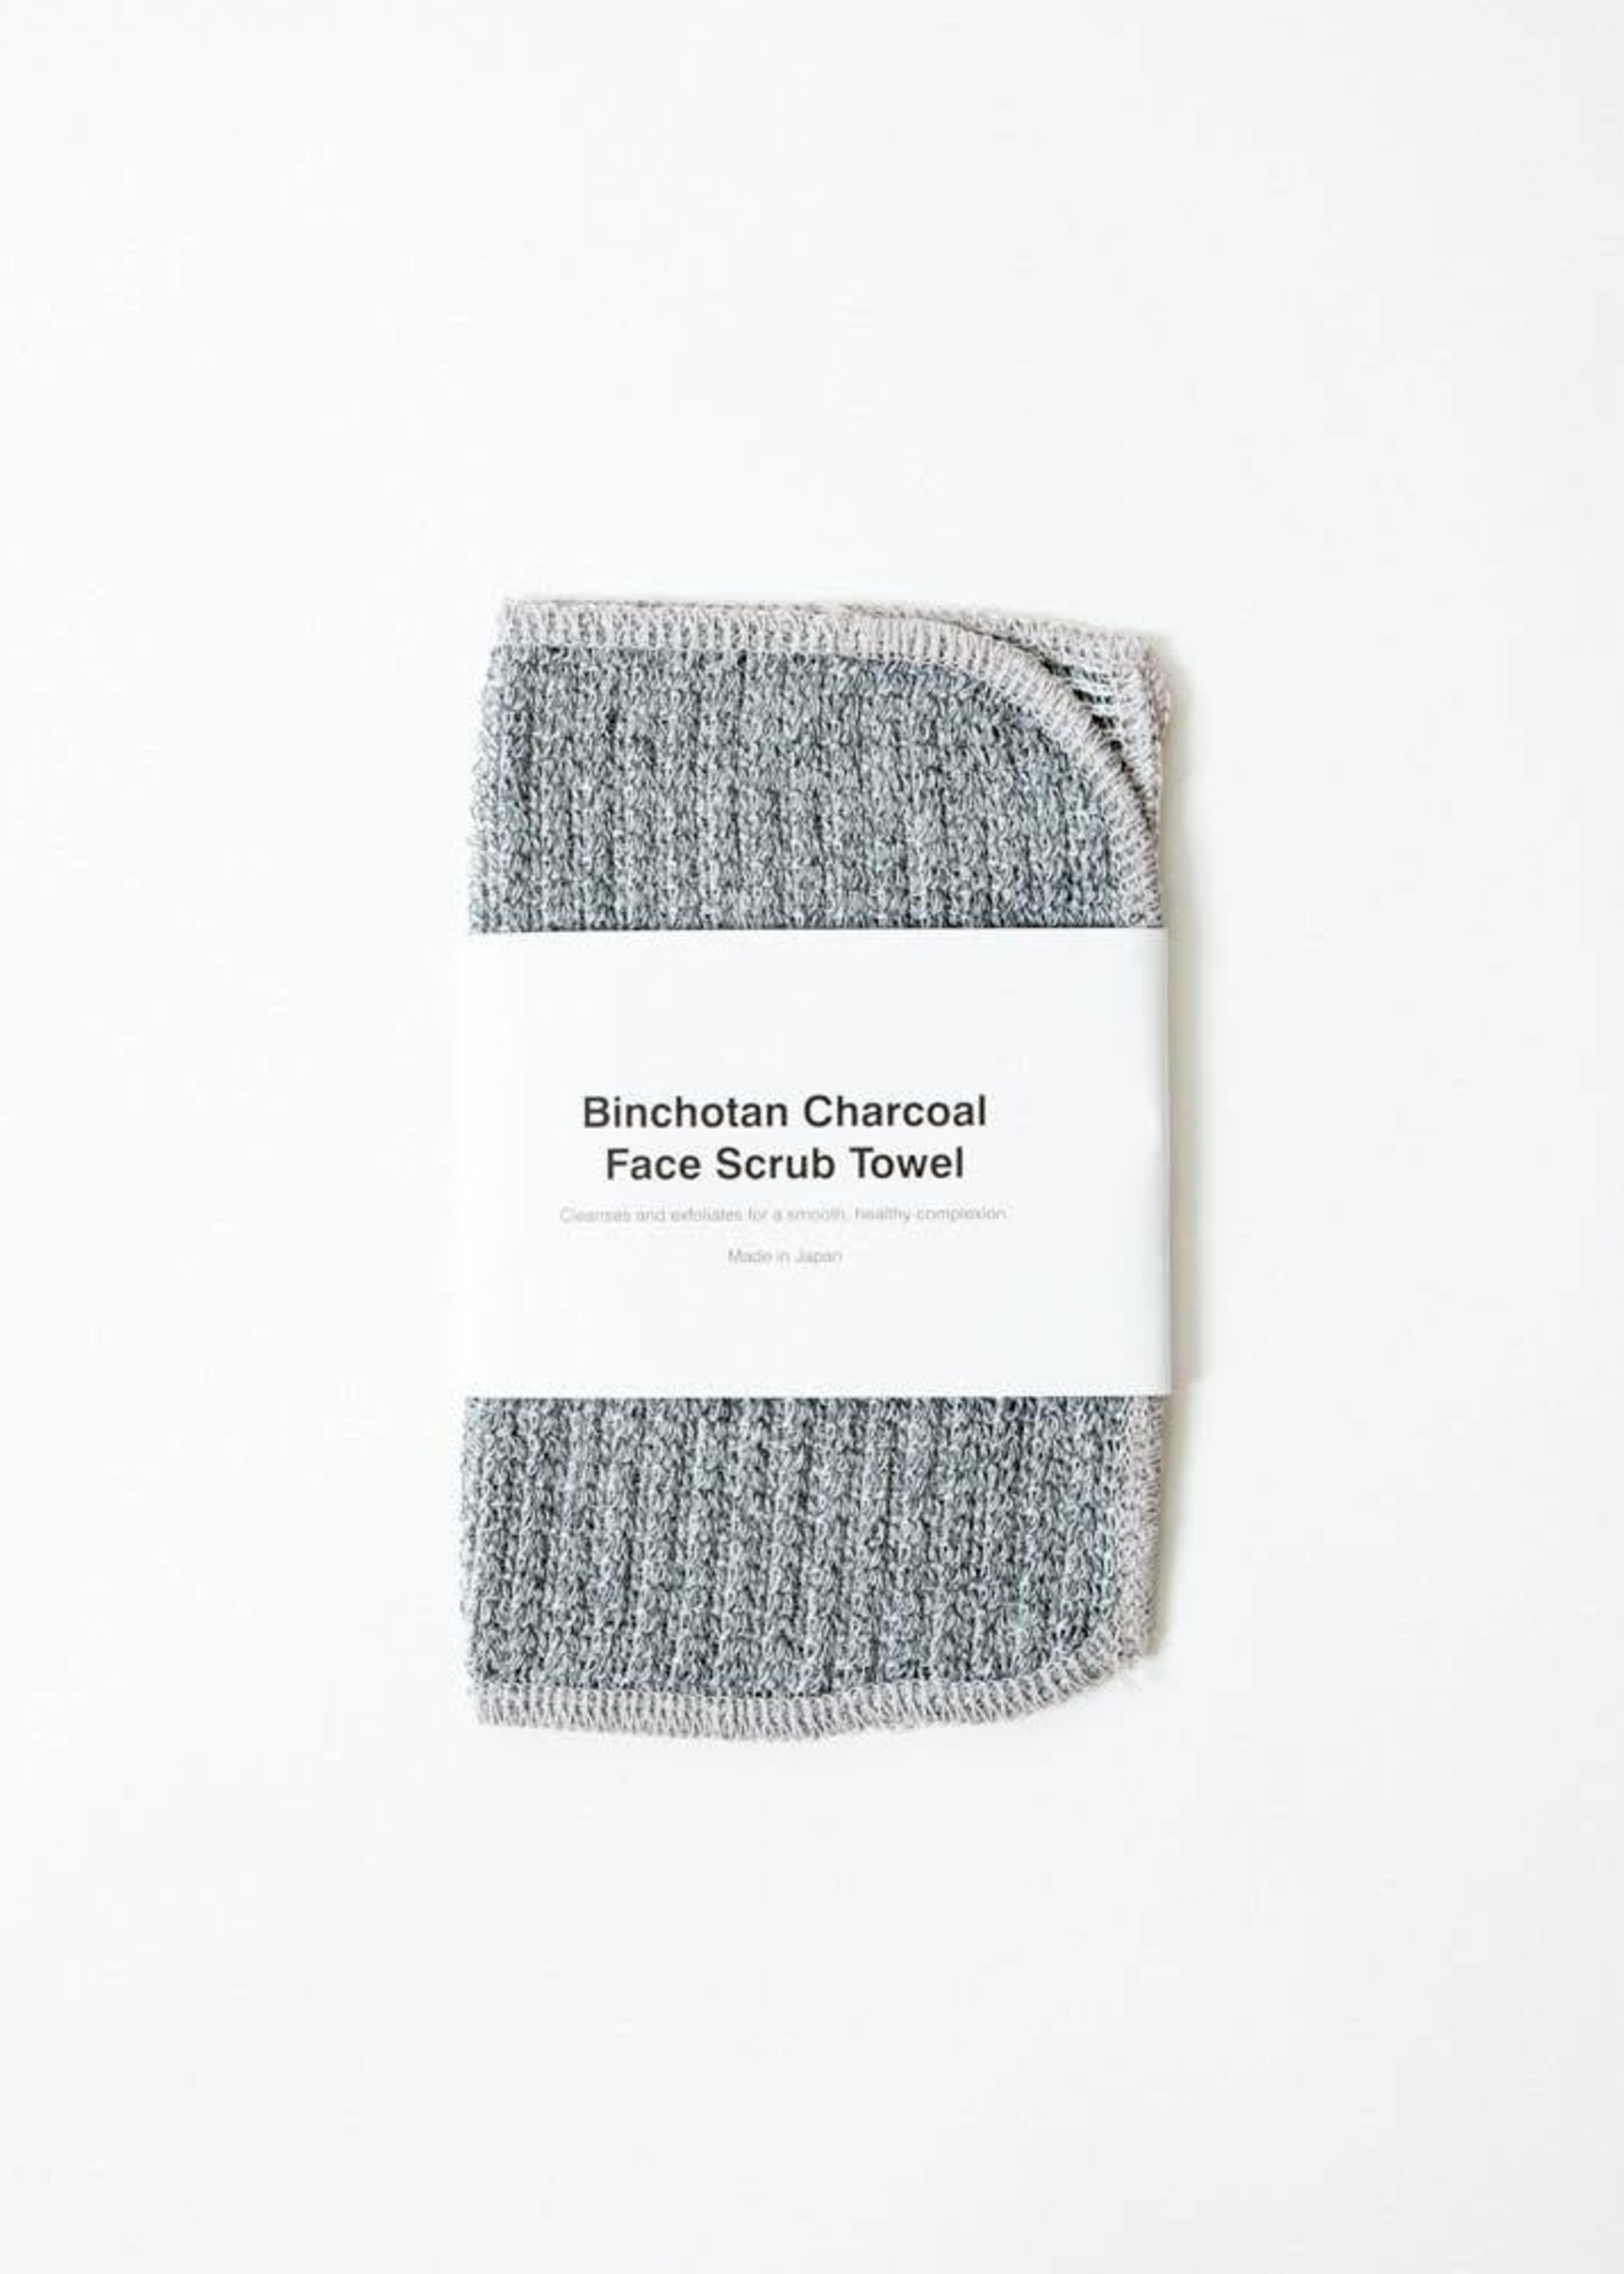 Morihata Binchotan Charcoal Face Scrubbing Towel